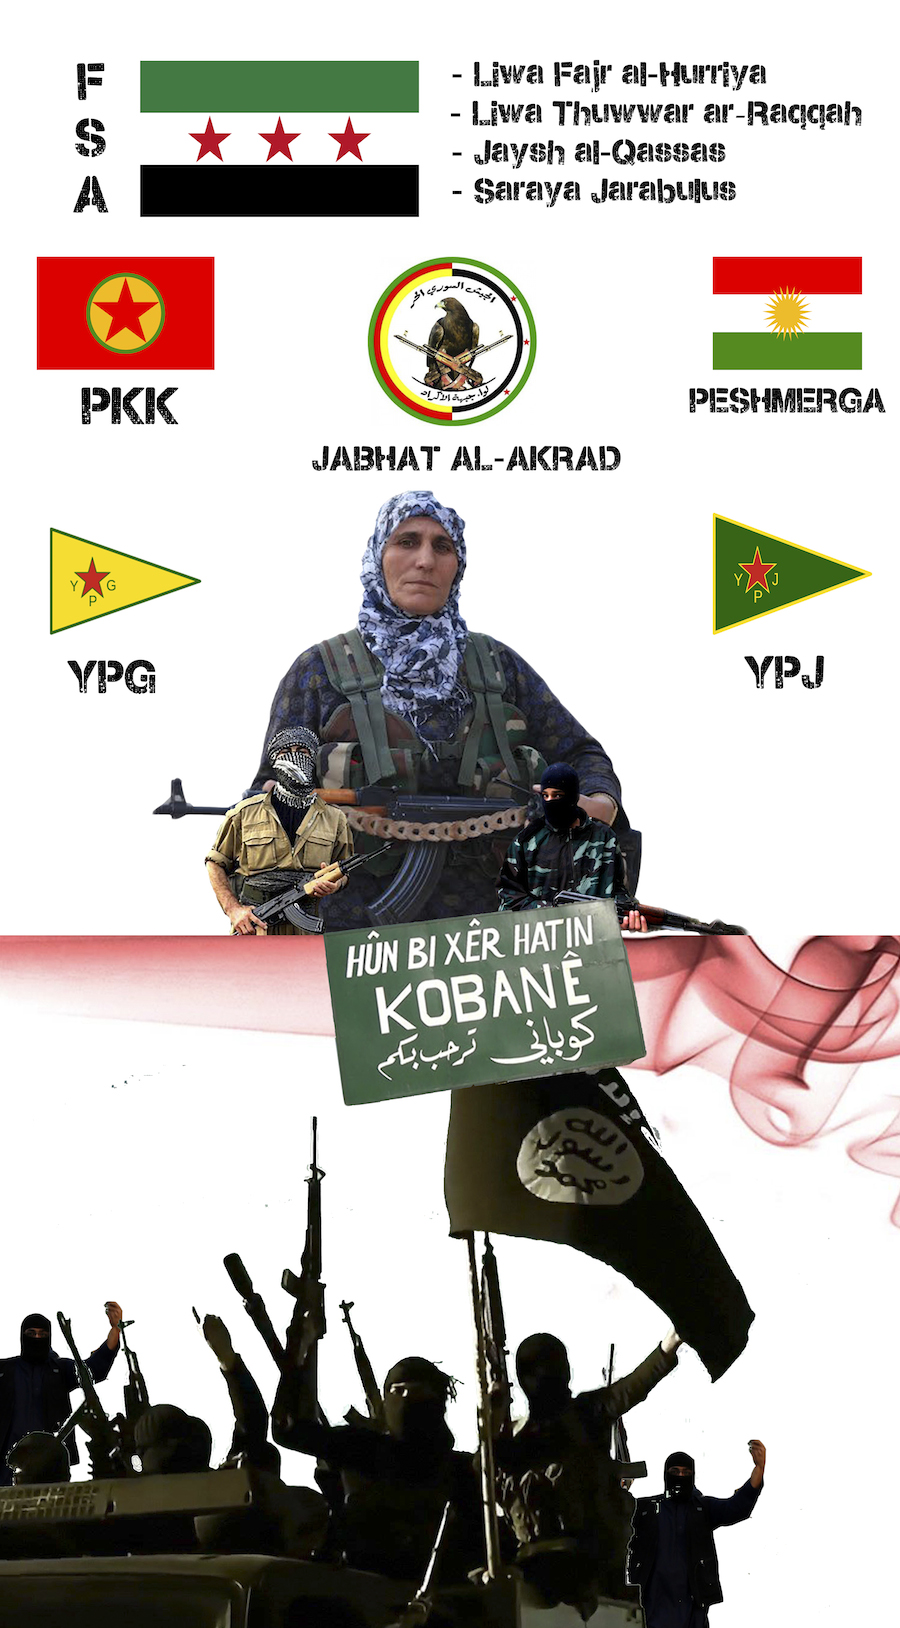 milizie - kobane - infografica di valerio evangelista - frontiere news